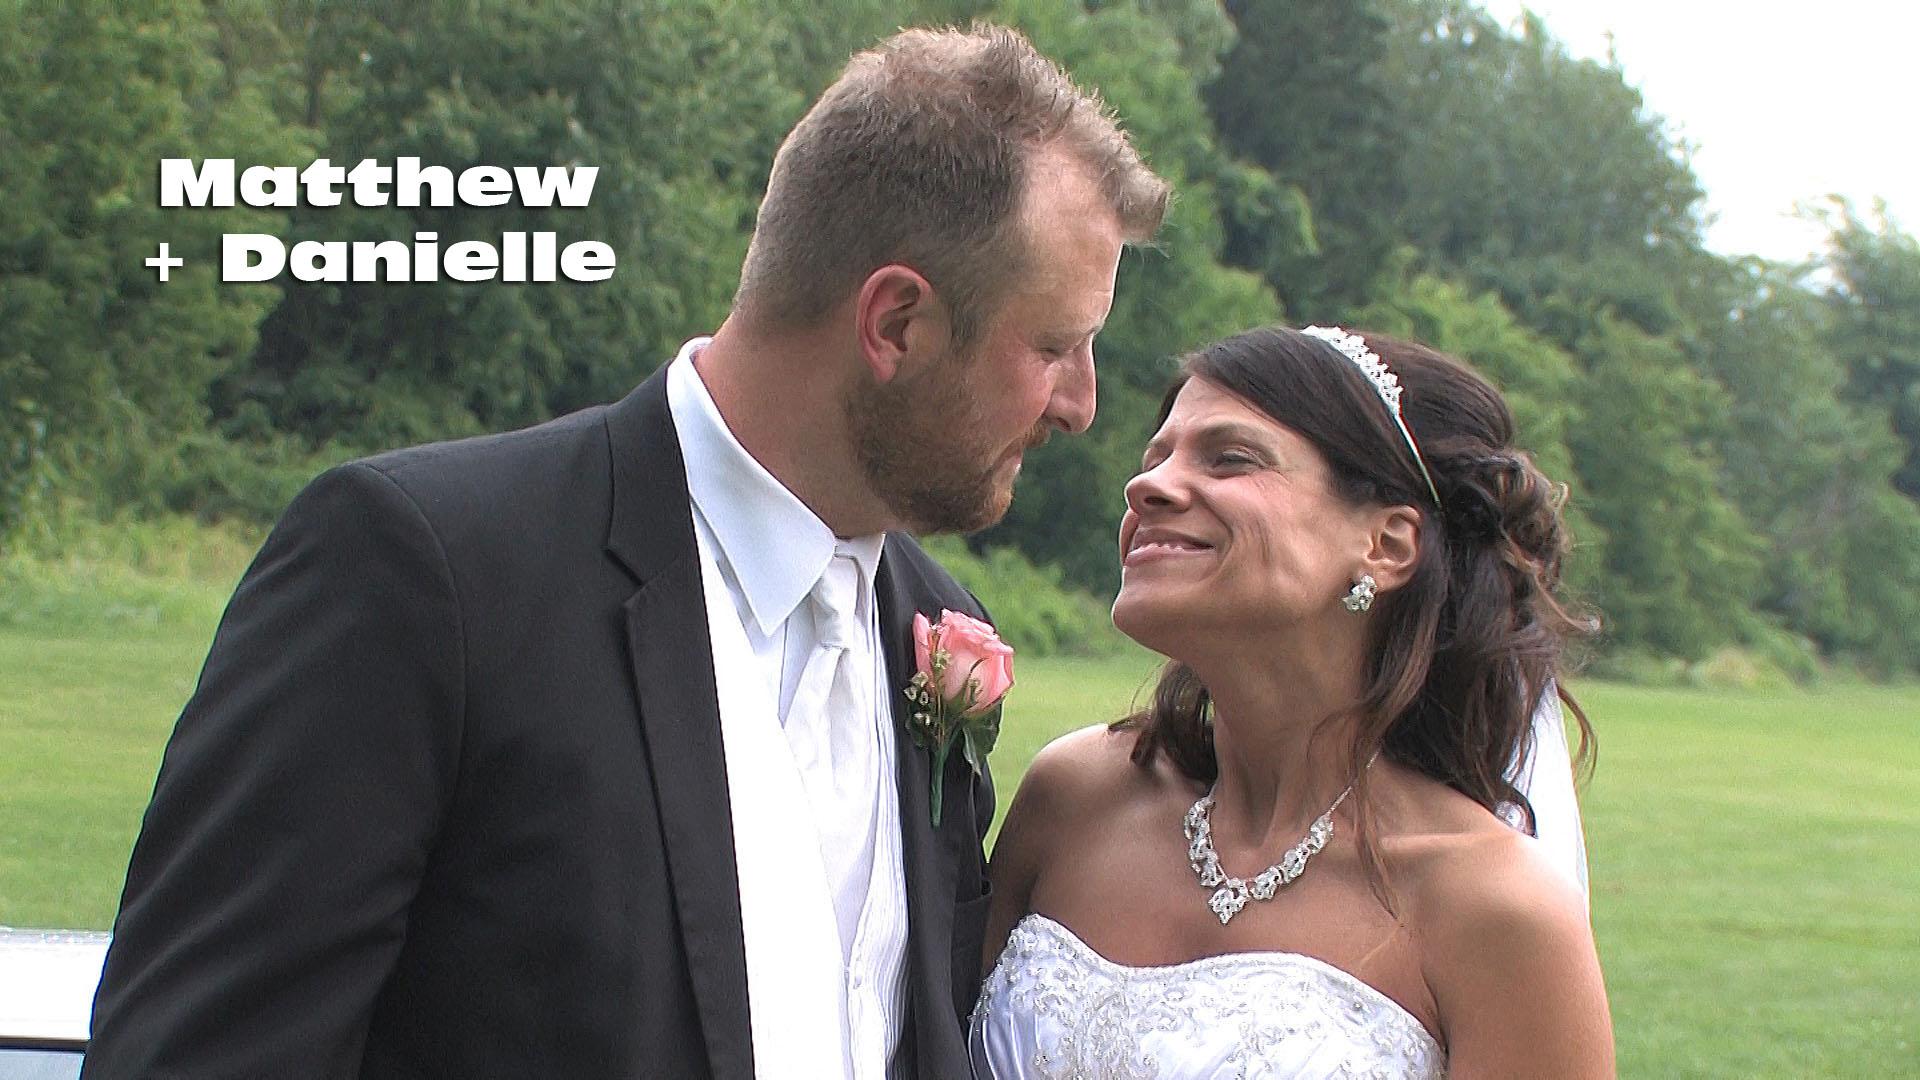 Matt & Danielle – Lockport Wedding Video